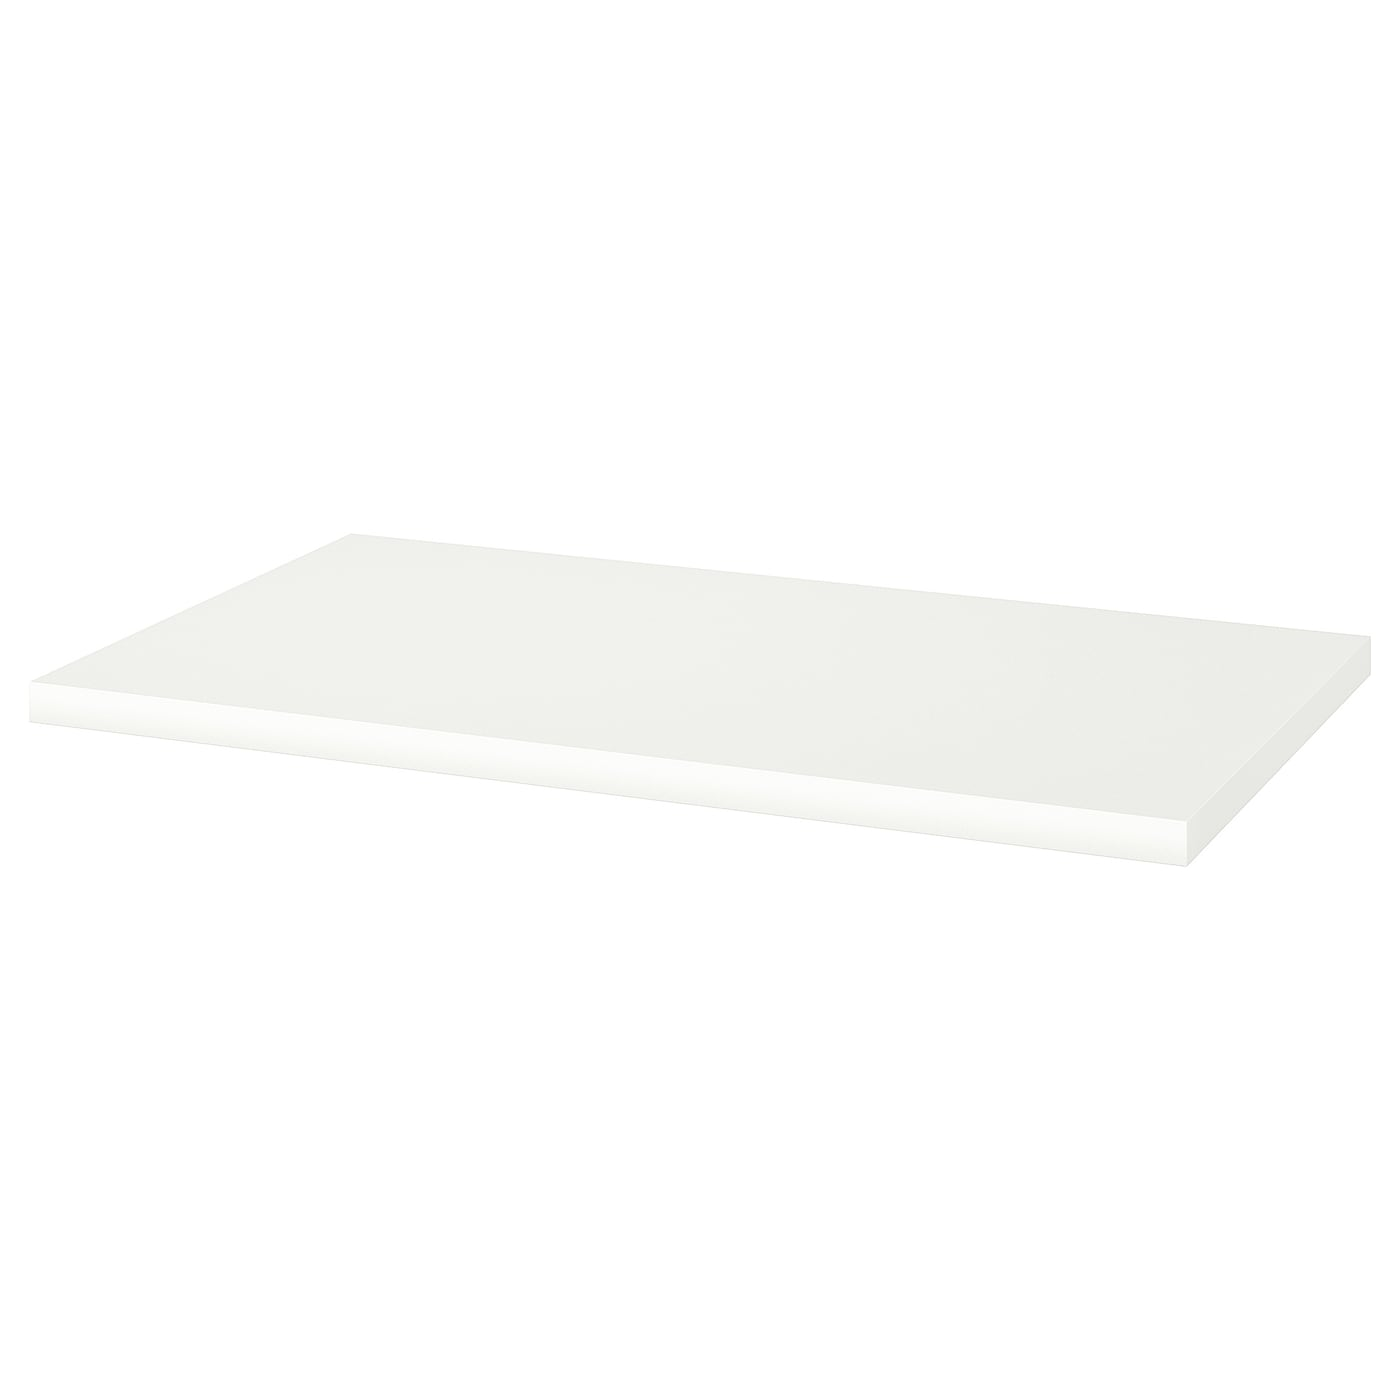 Linnmon White Table Top 100x60 Cm Ikea